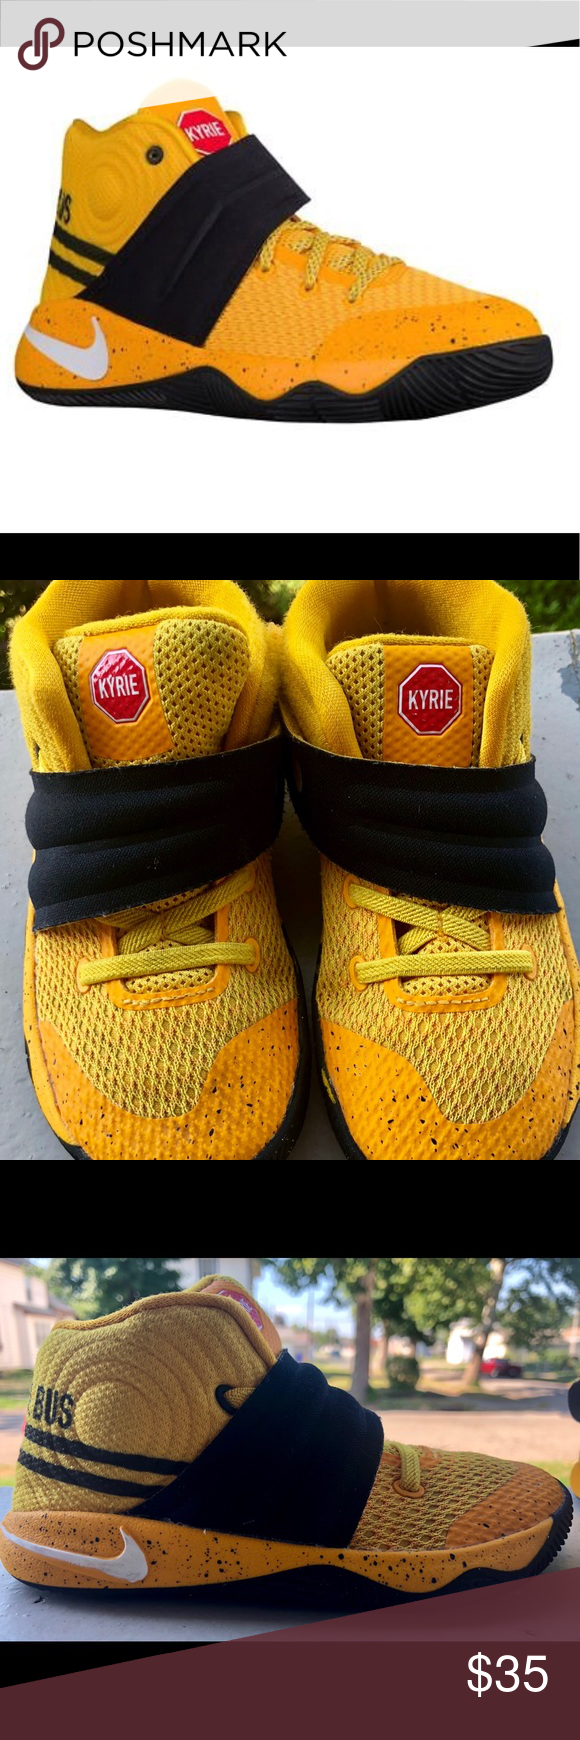 Nike Kyrie 2 Gs School Bus Shoes Nike Kyrie 2 Gs School Bus